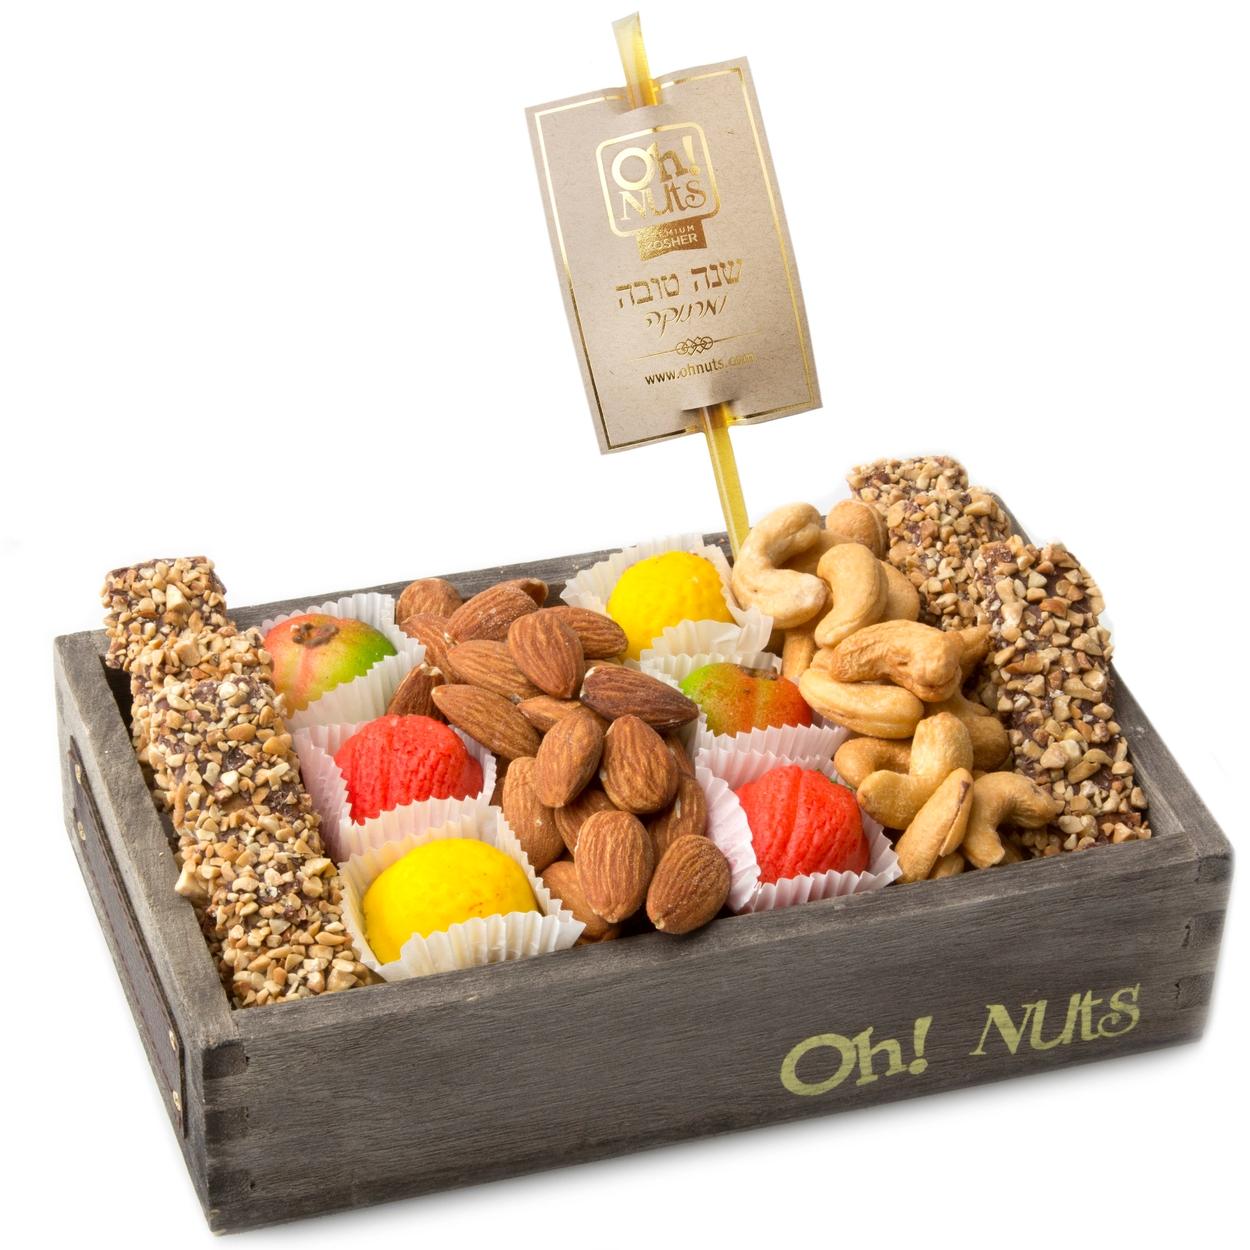 Rosh Hashanah Wooden Gift Tray